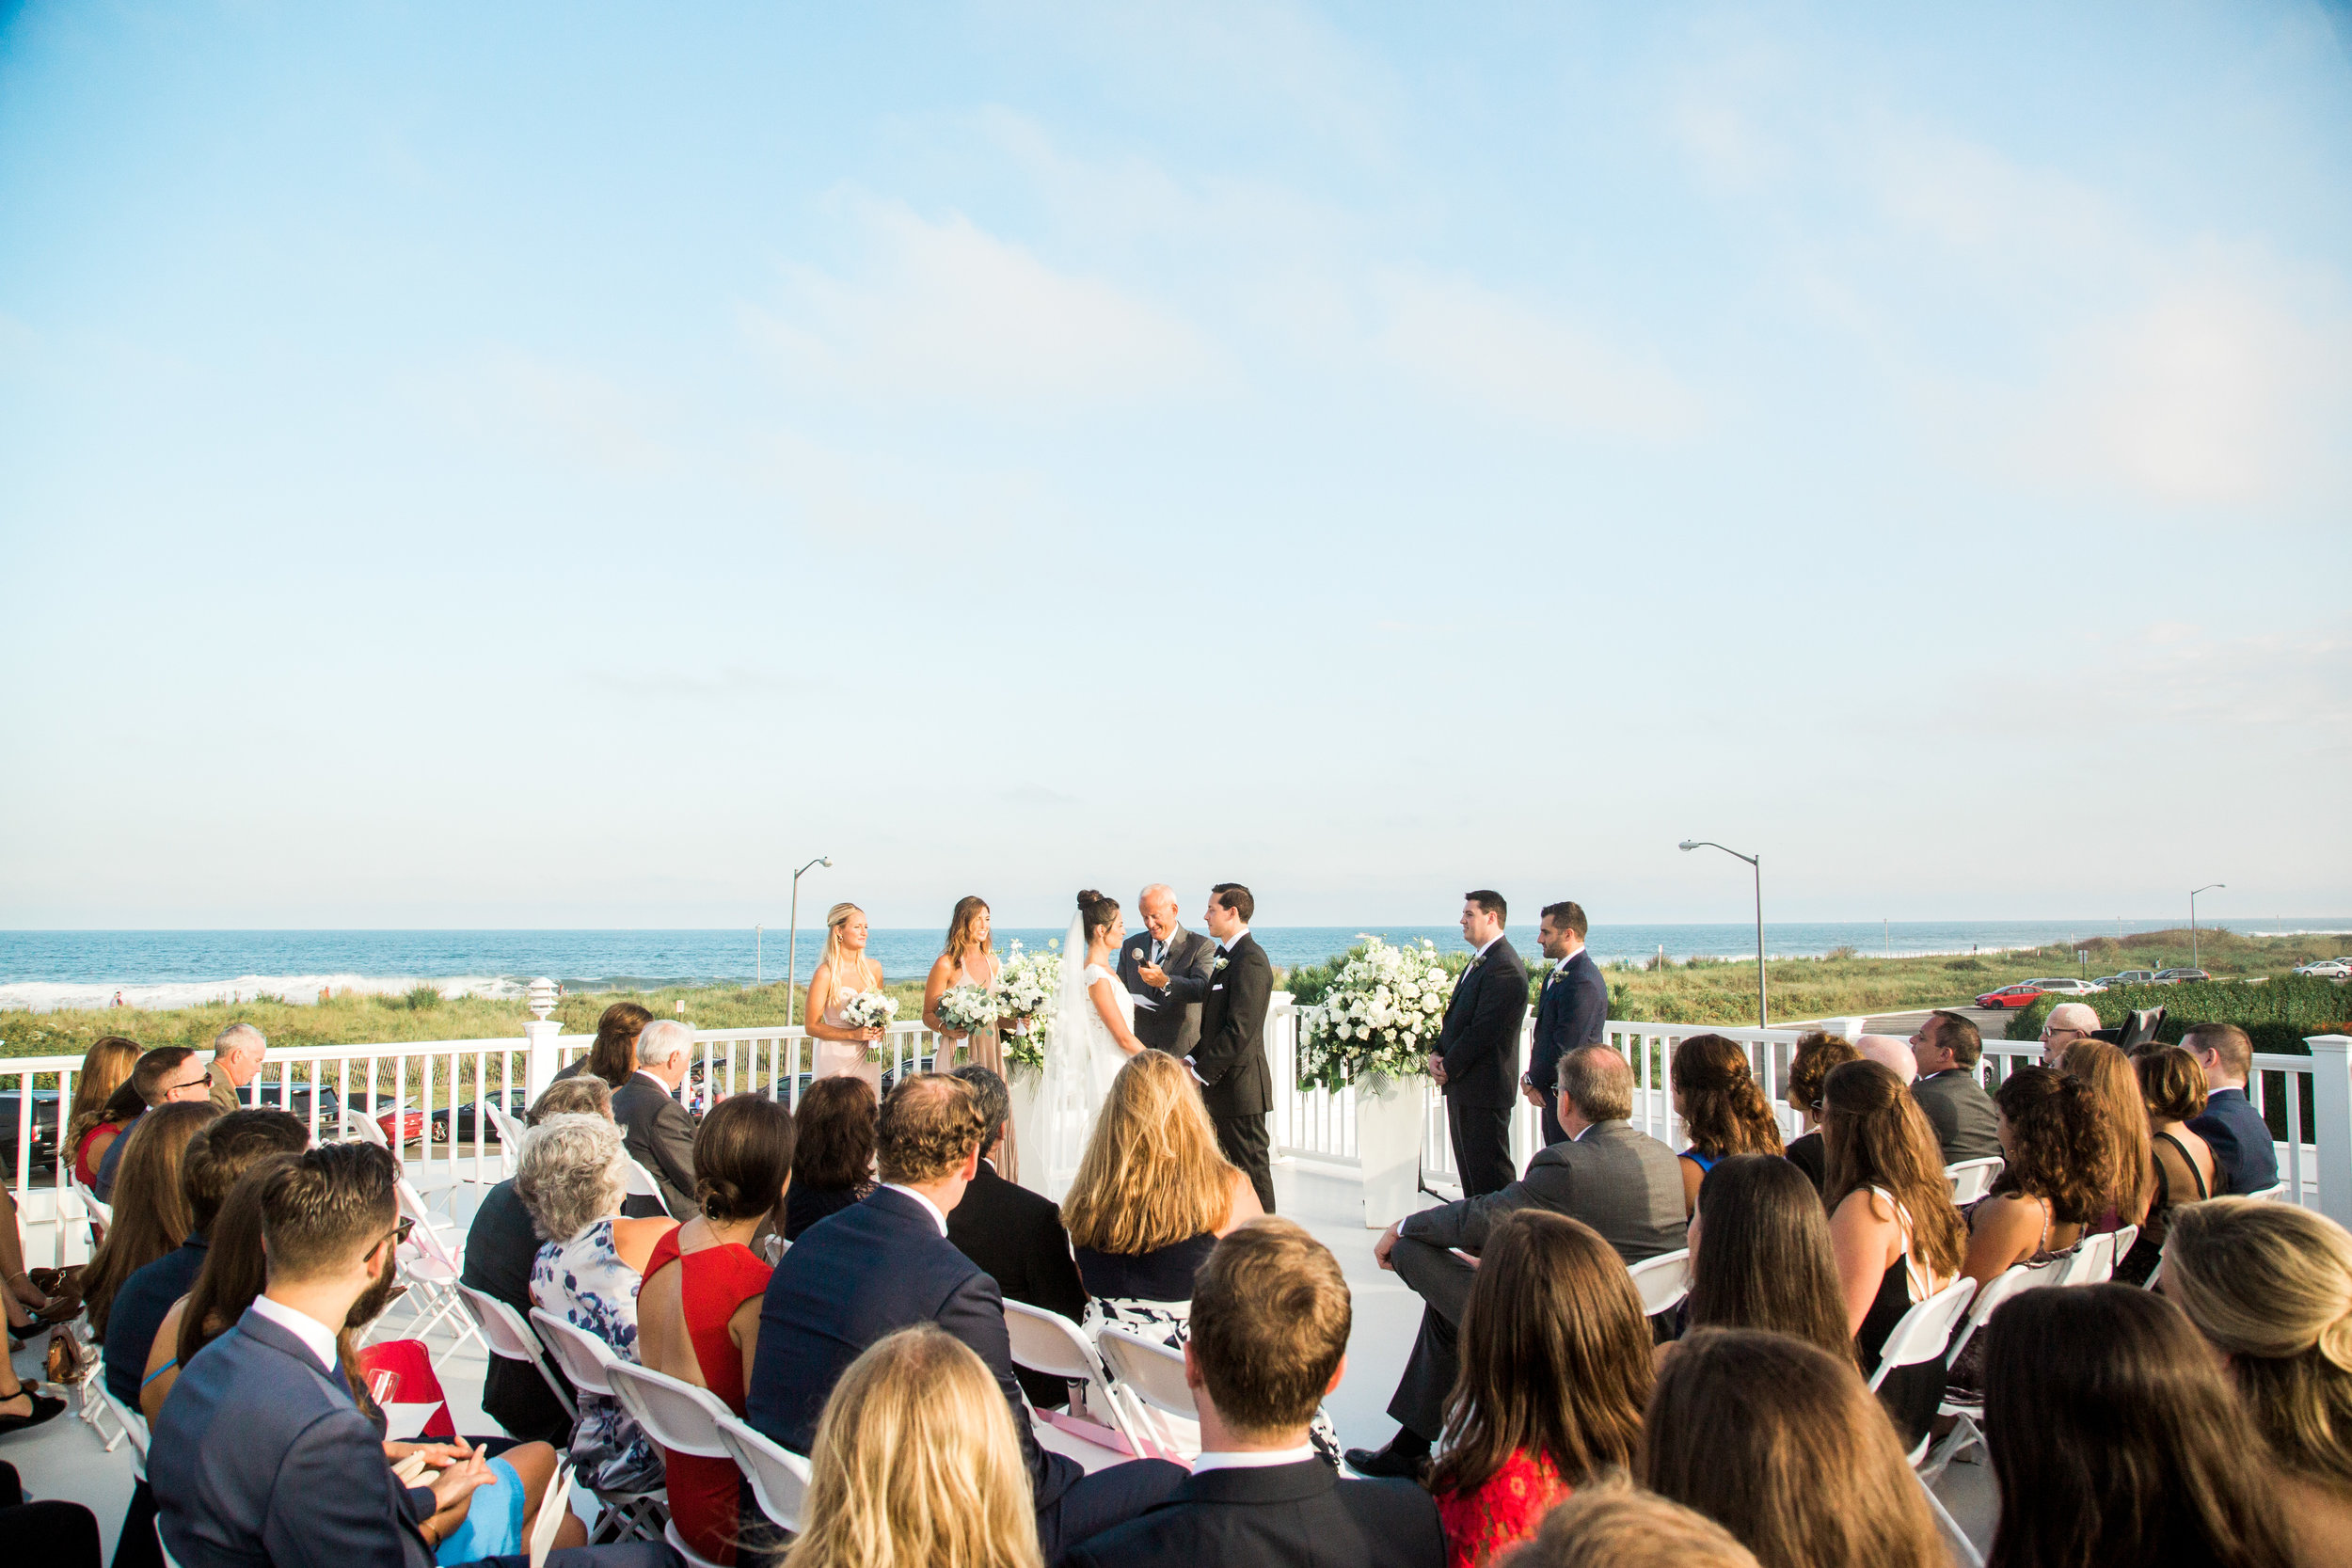 Spring-Lake-New-Jersey-Beach-Wedding-Photographer_272.jpg